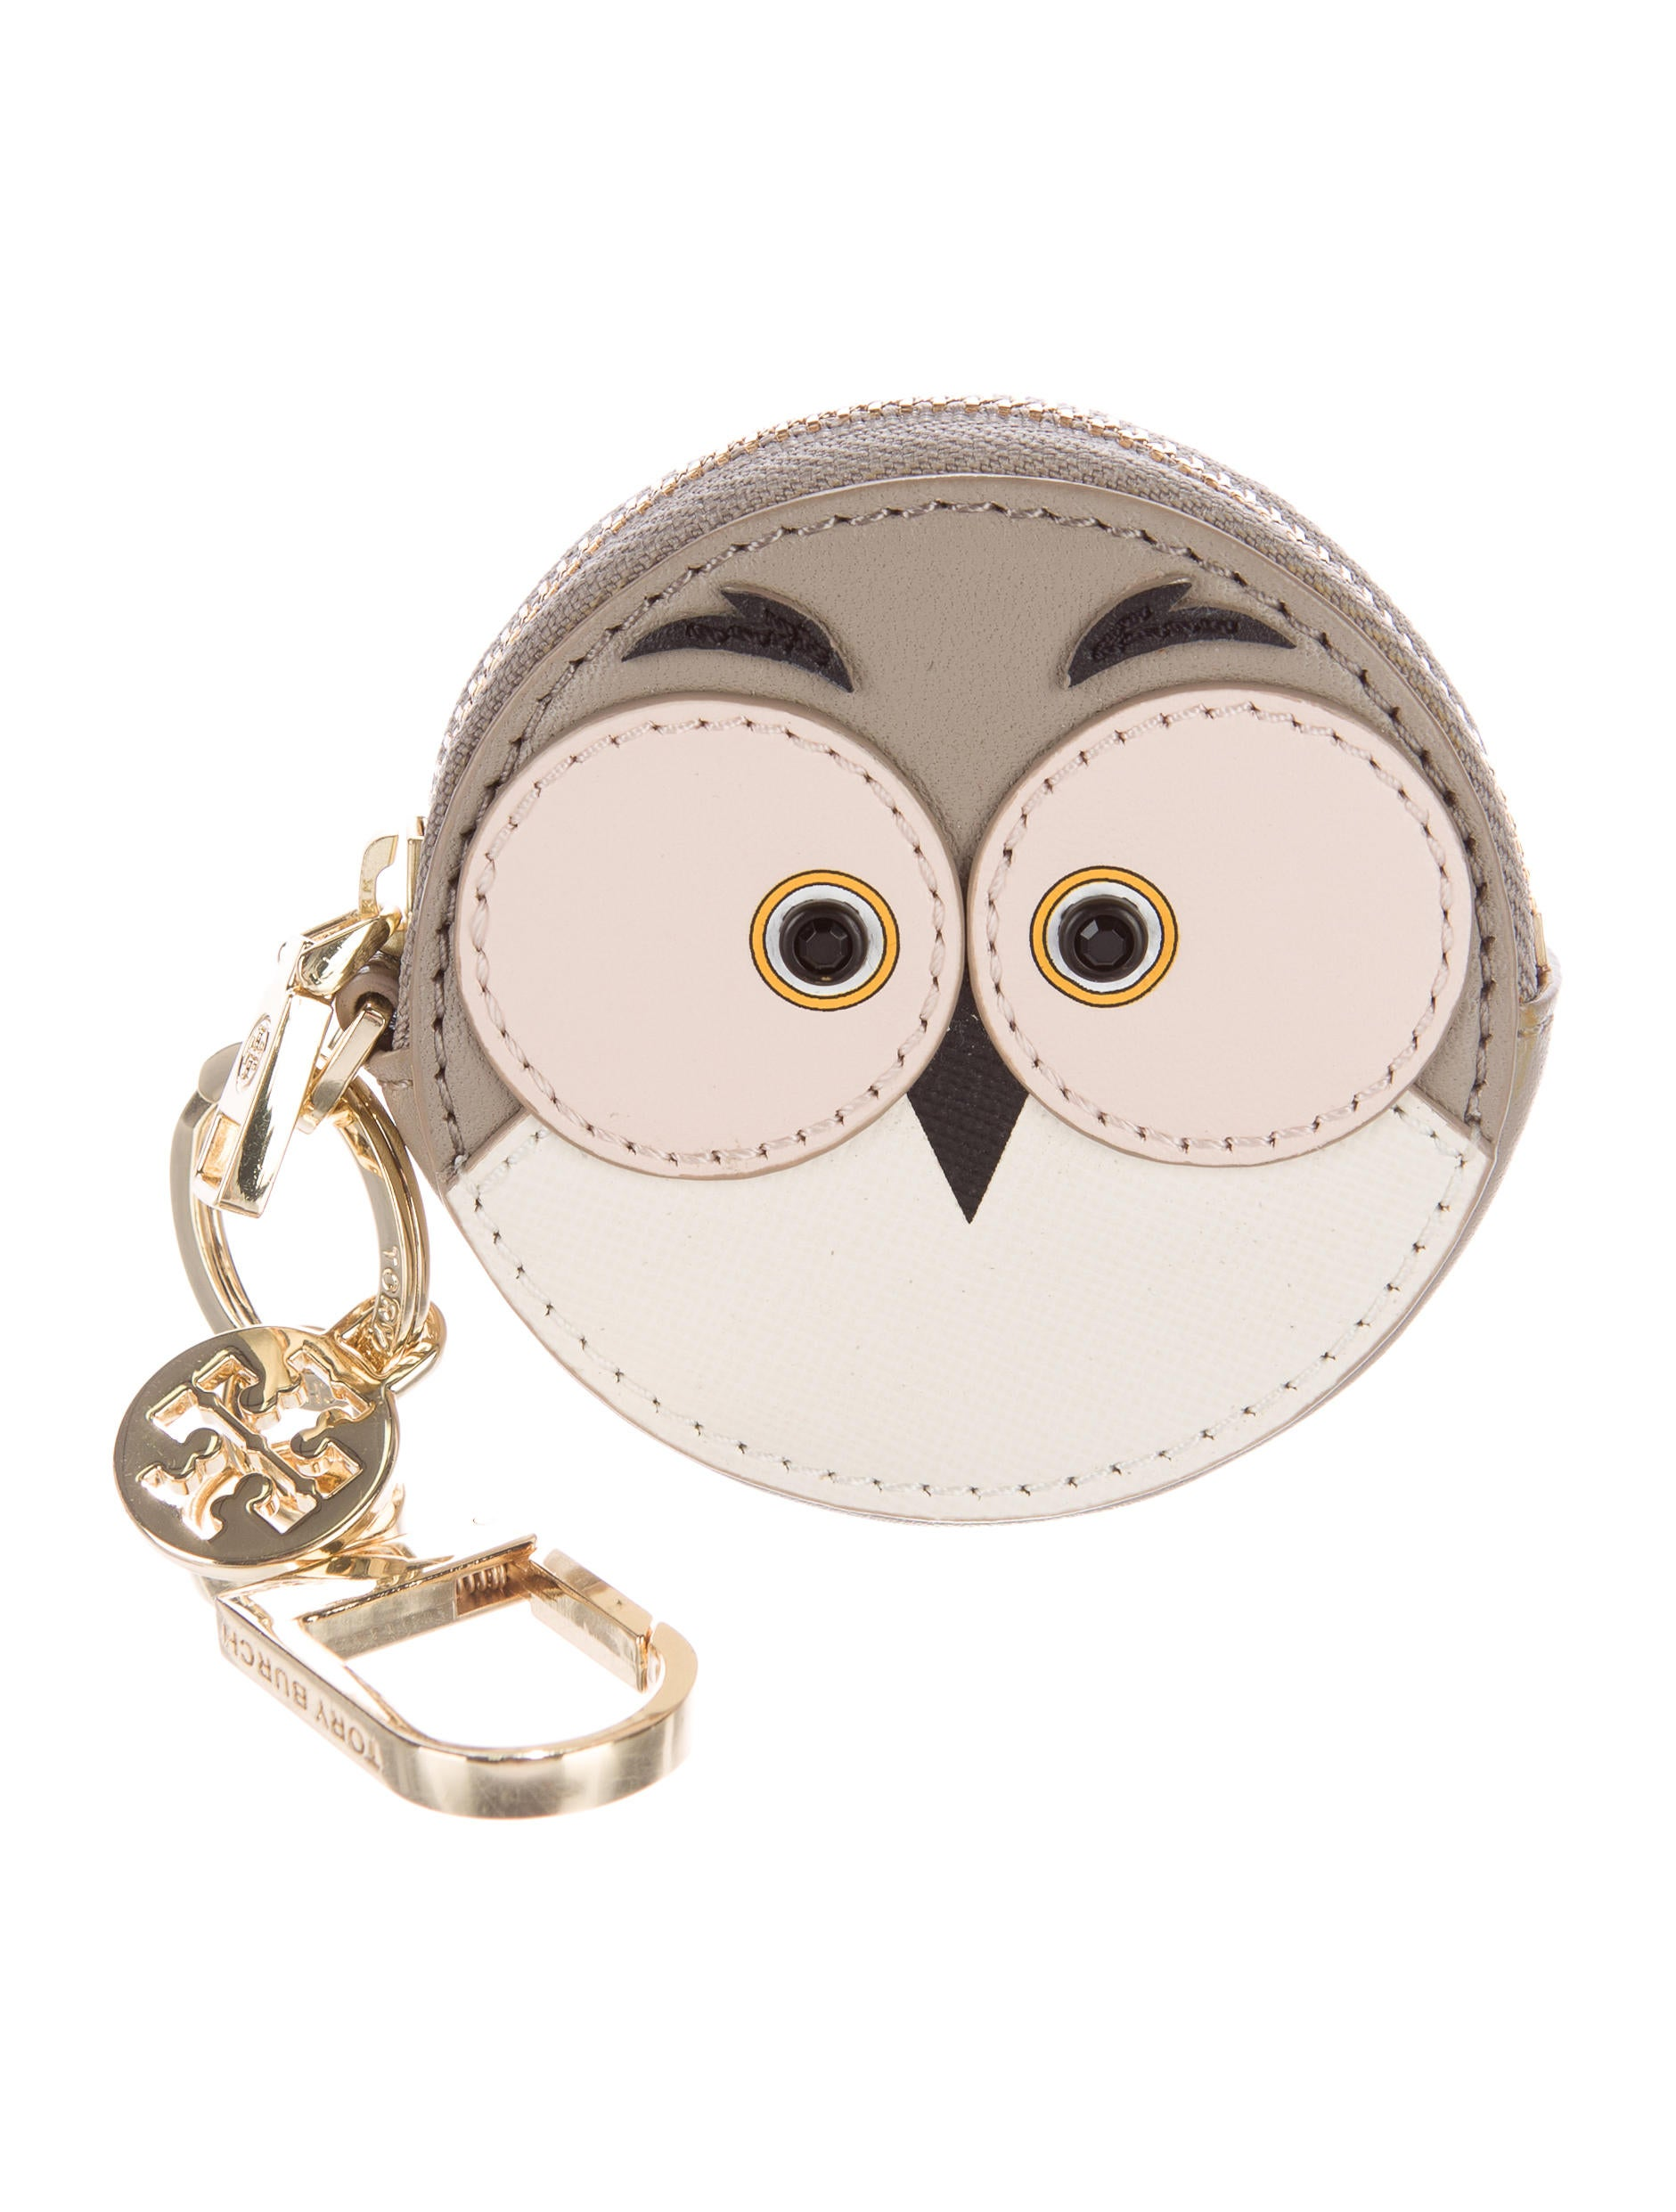 5b763d0f1fb Tory Burch Owl Coin Purse - Accessories - WTO88808